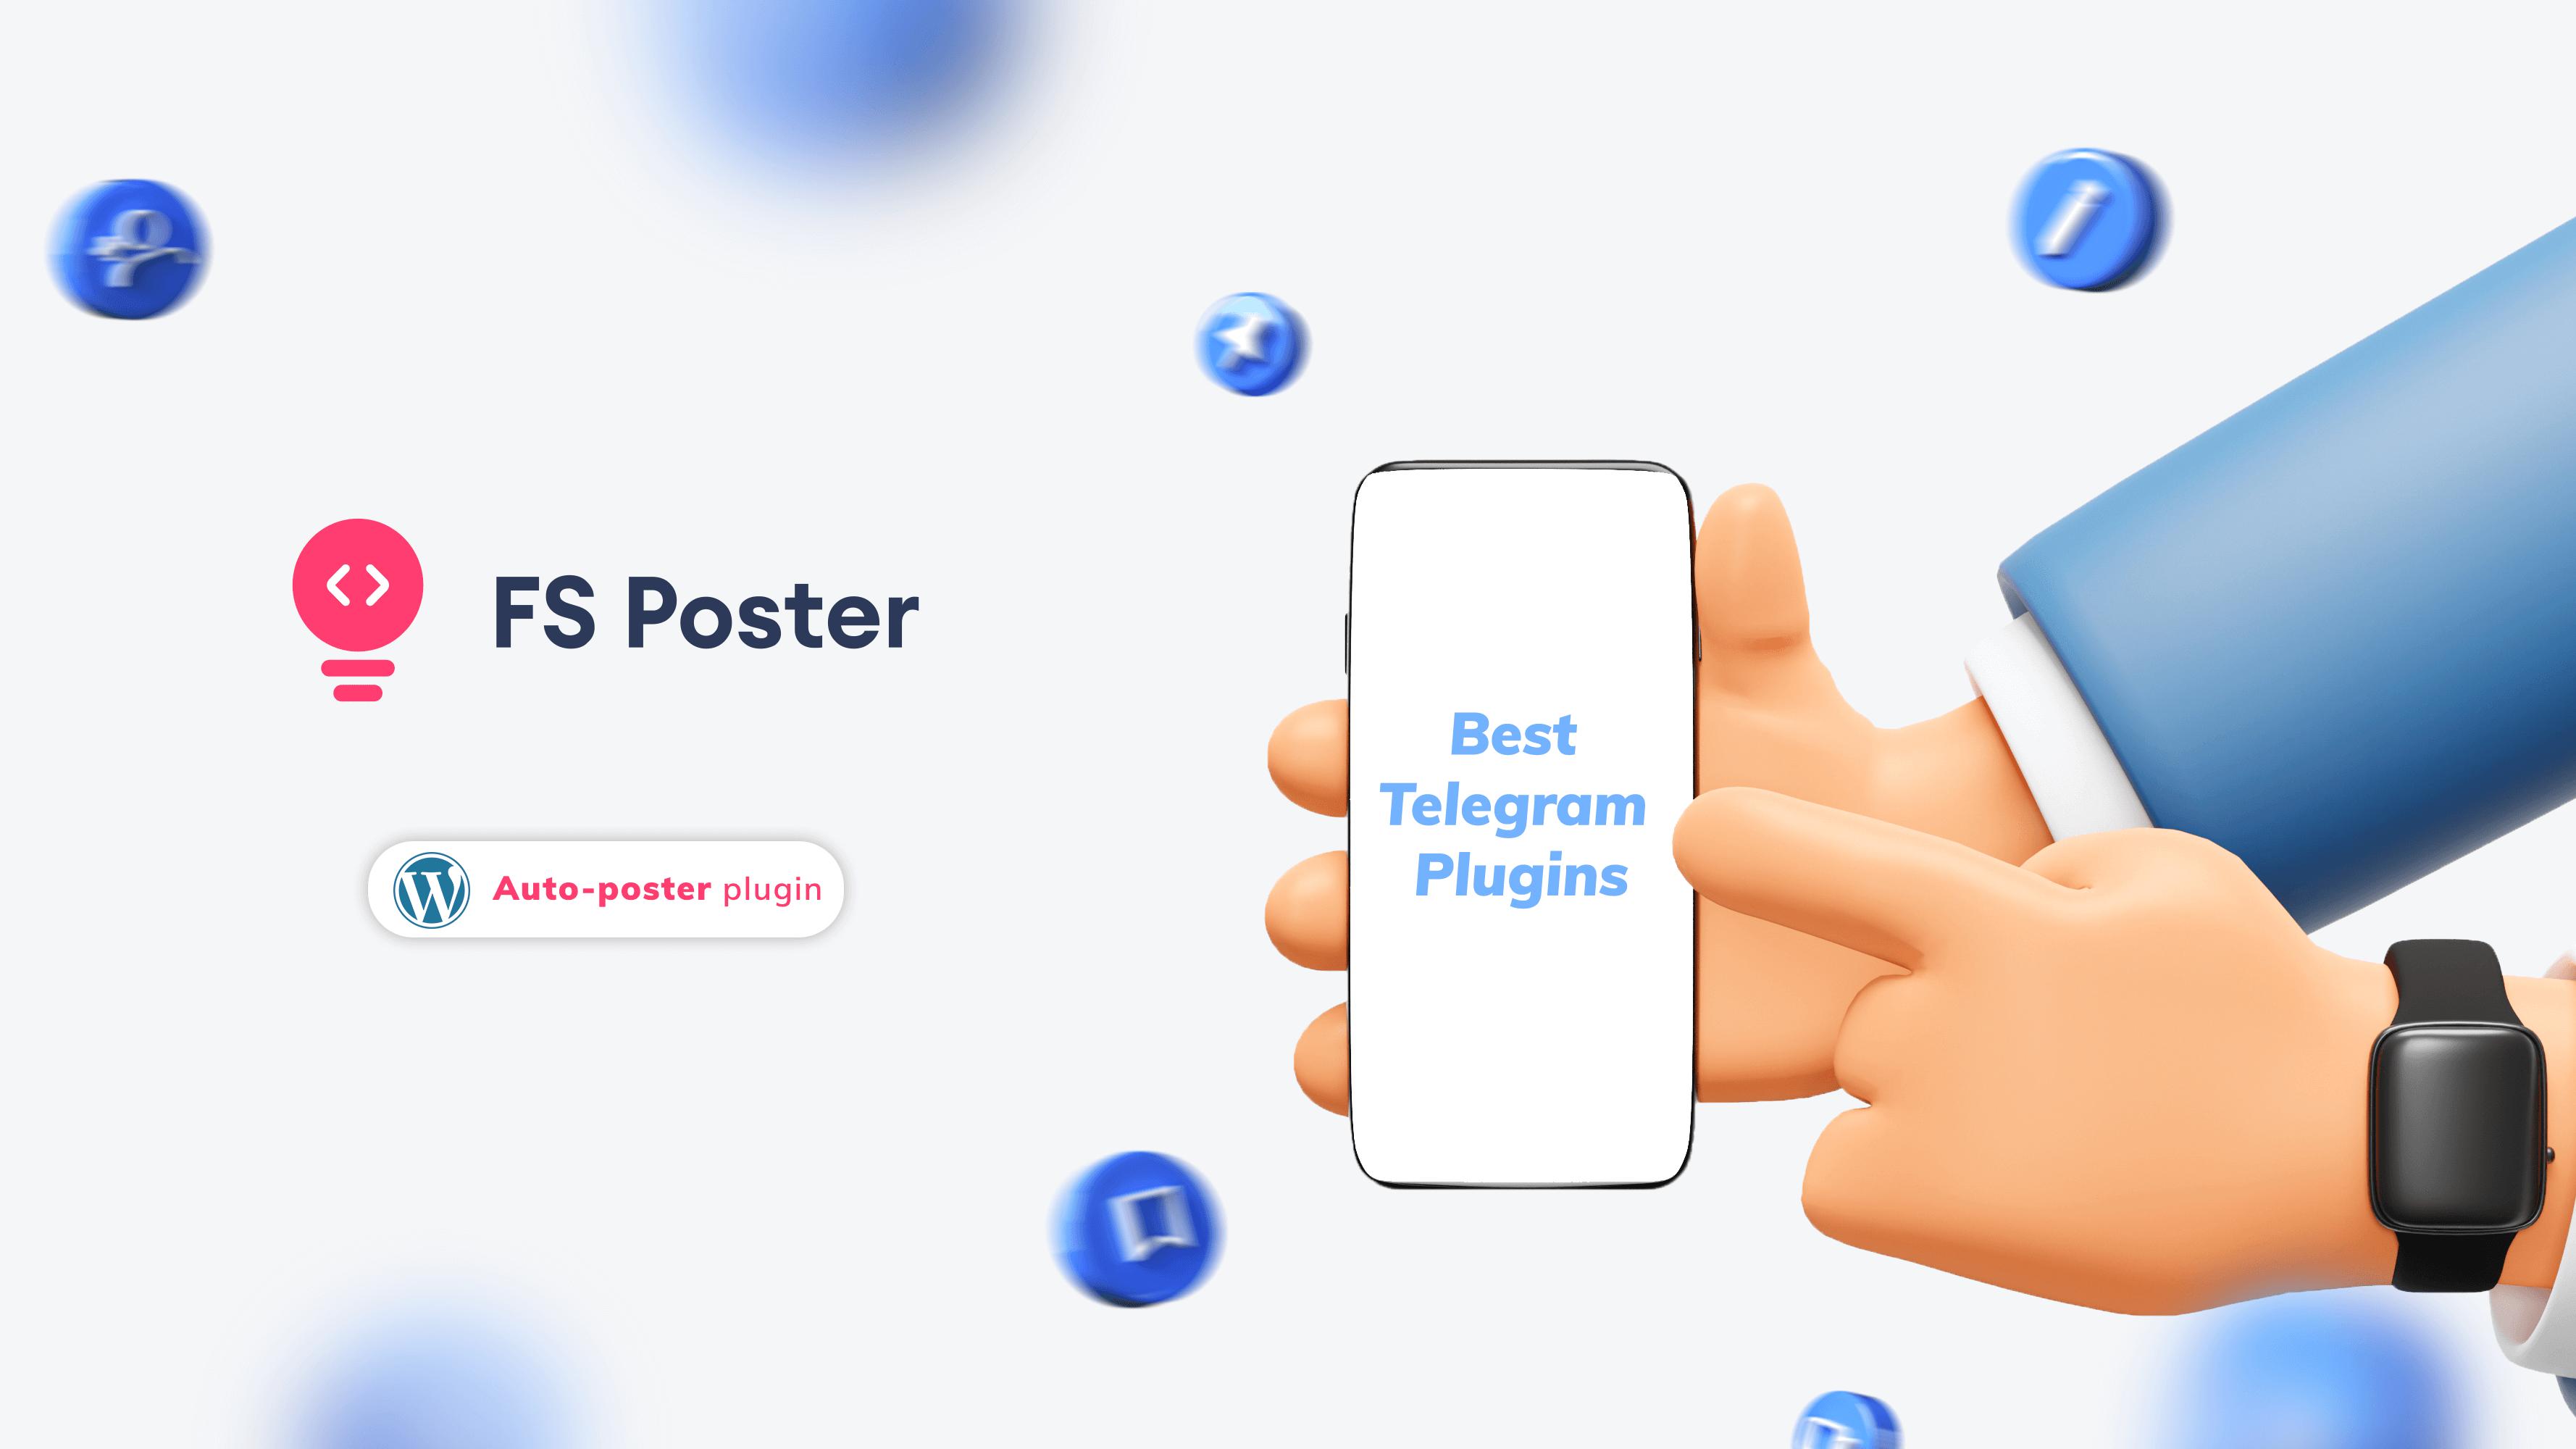 Top 6 best Telegram plugins for WordPress